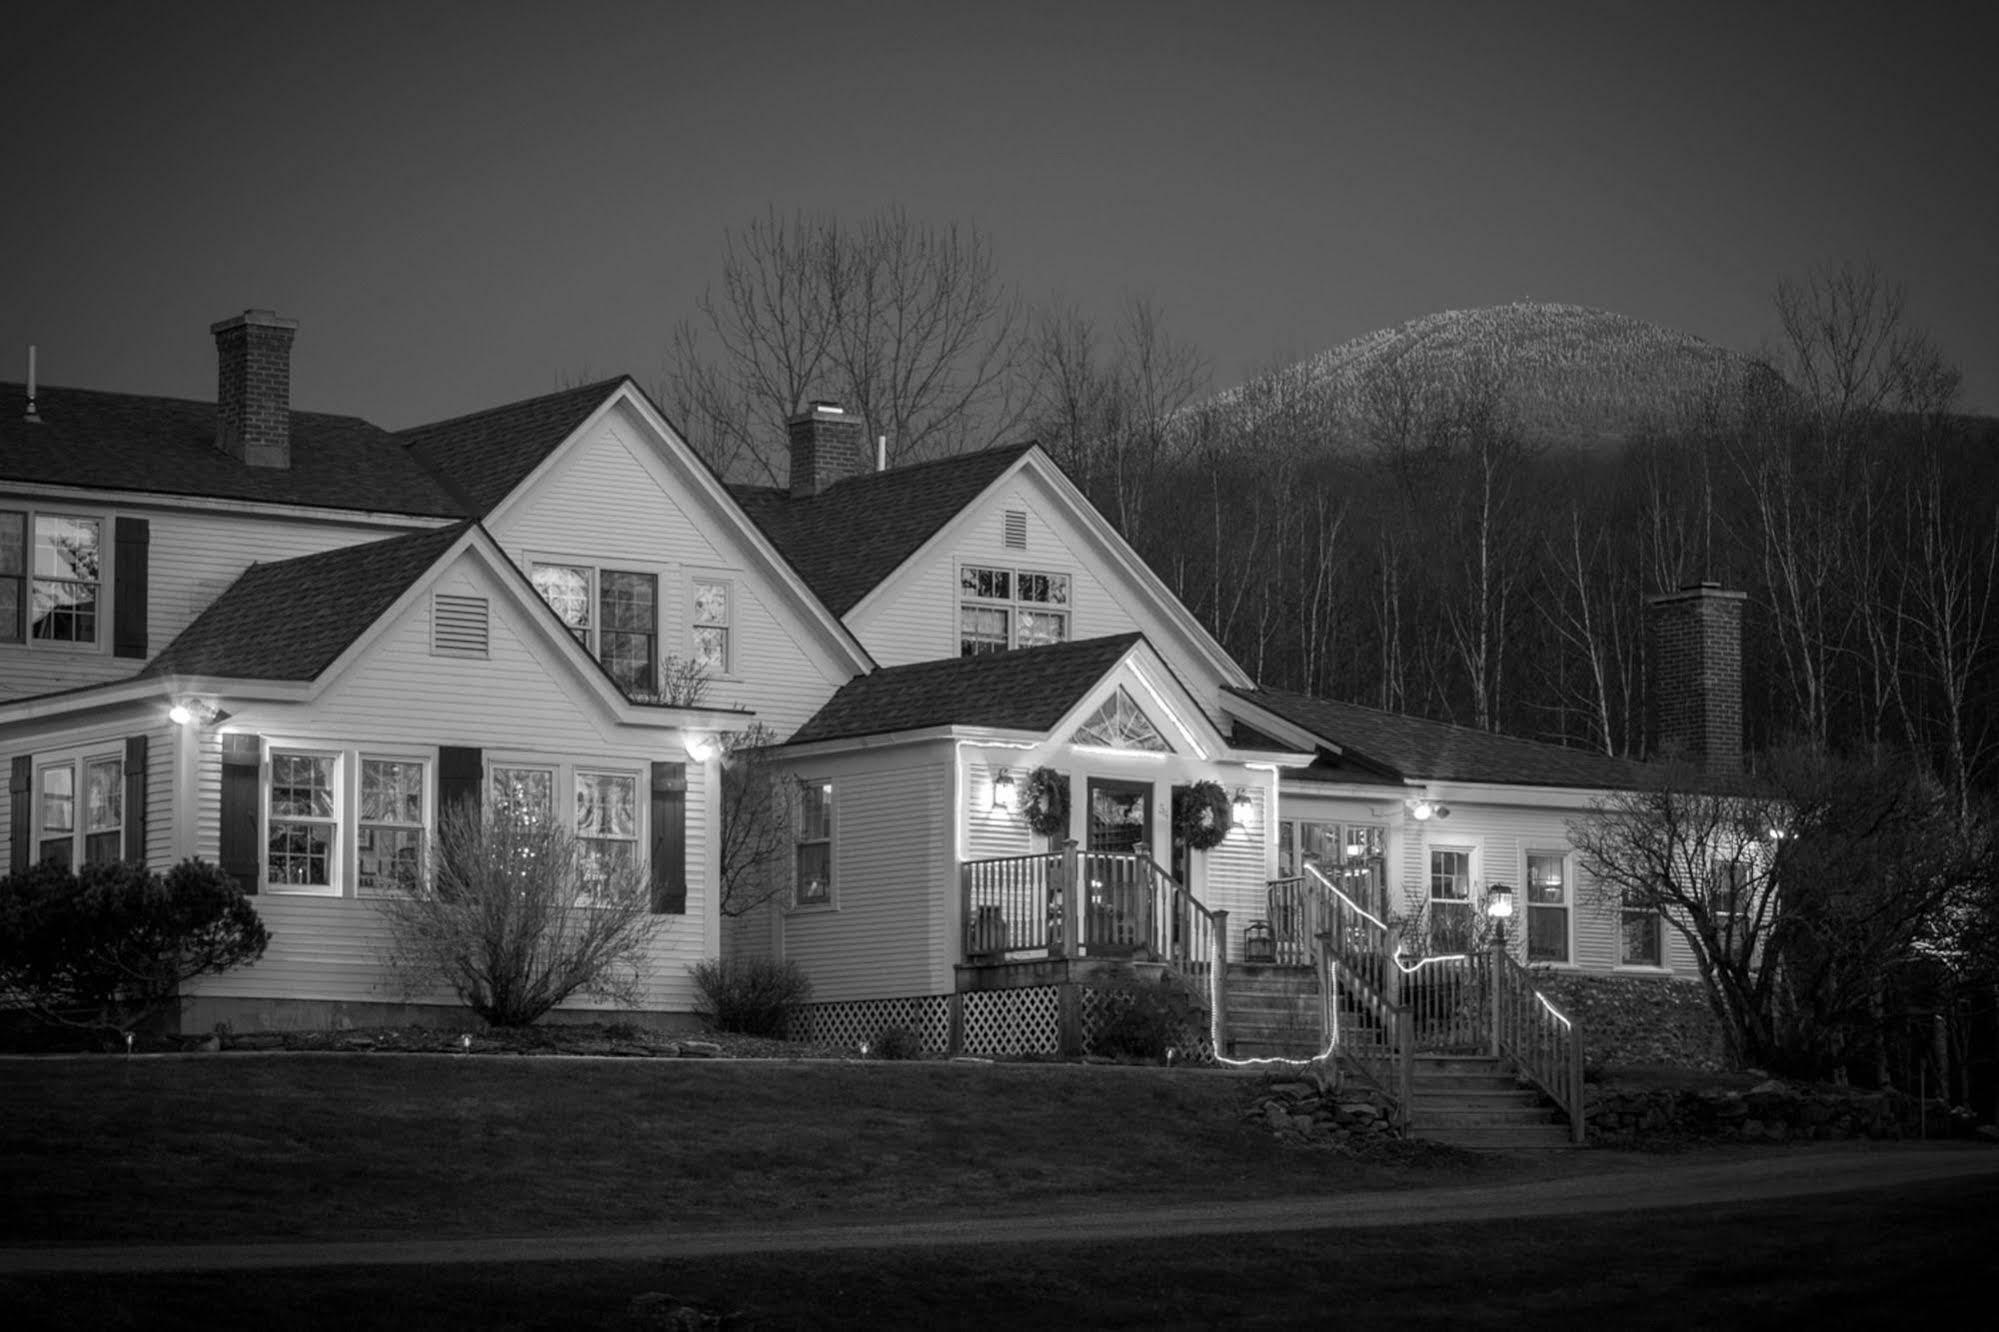 The Red Clover Inn and Restaurant